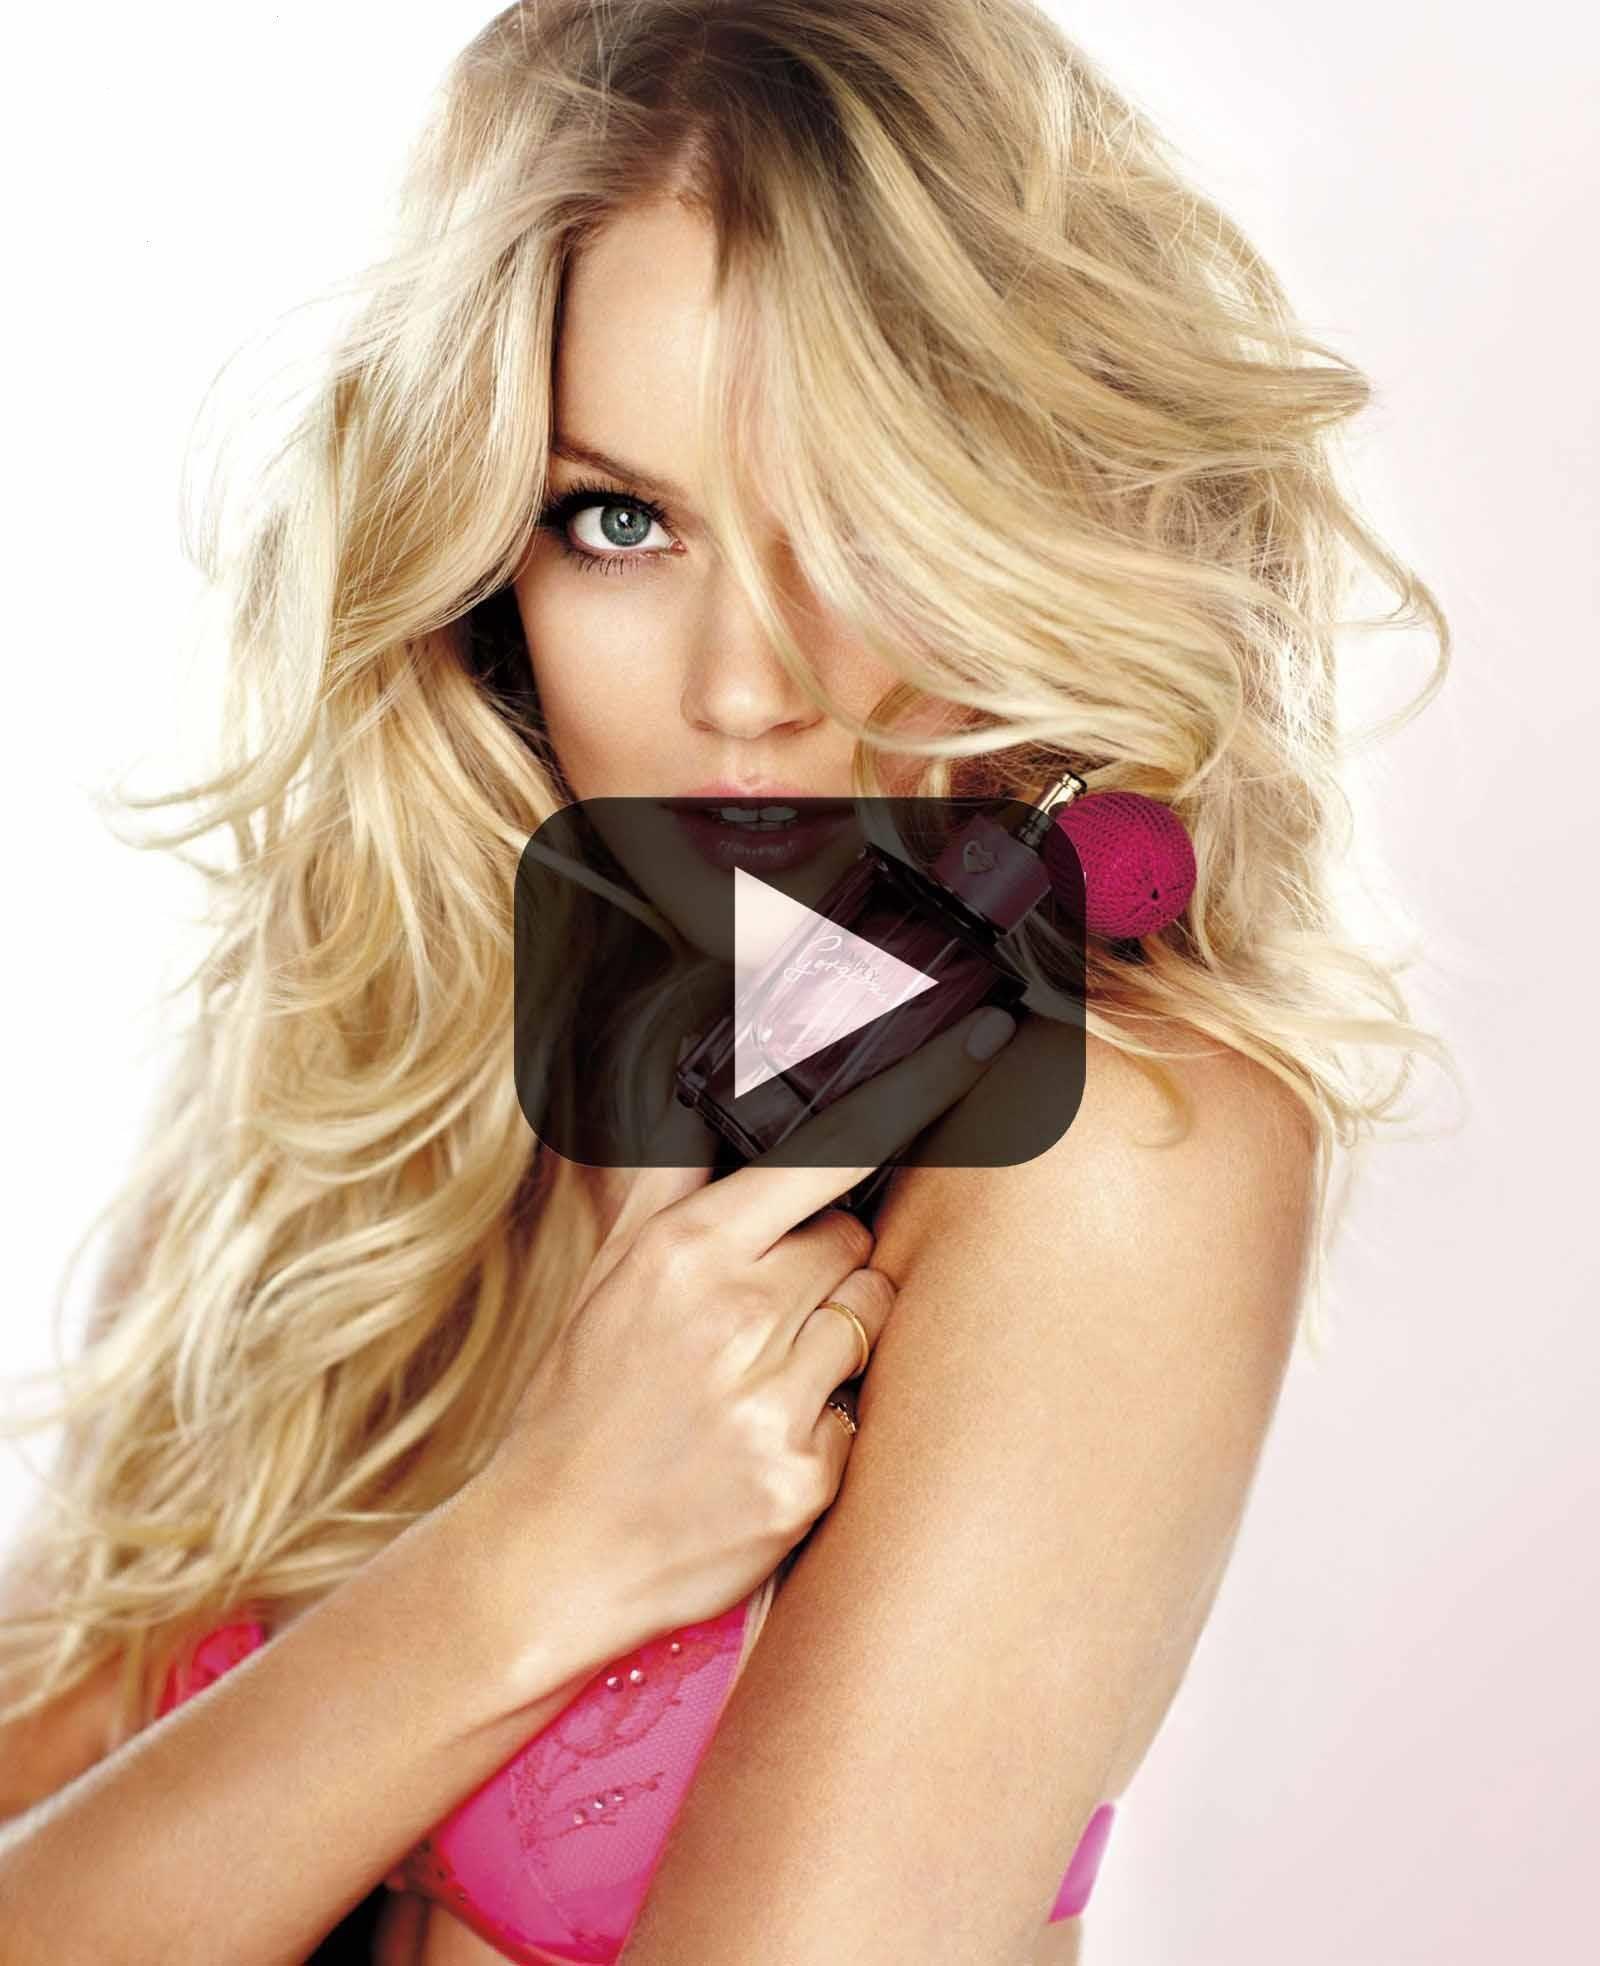 verified amateur creampie #sex #porn #video #phote #hot #girls